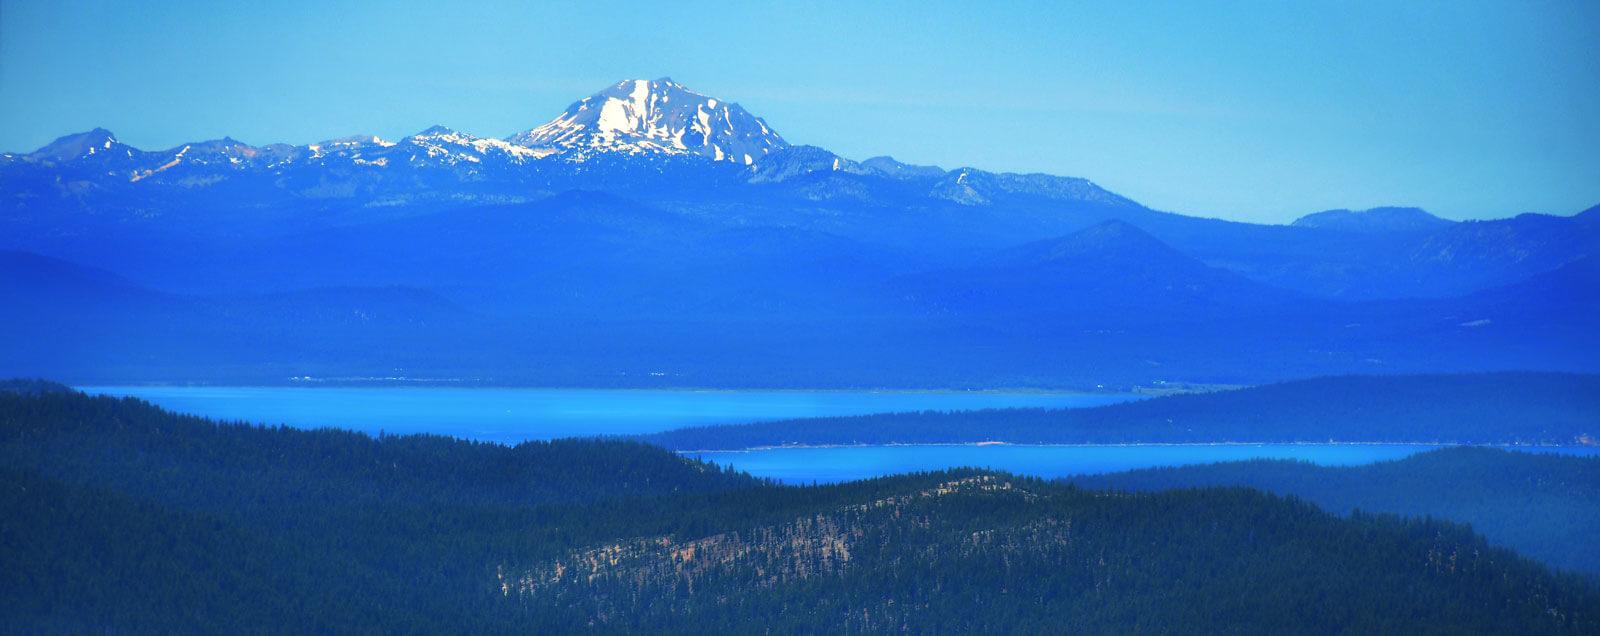 Mt. Lassen and Lake Almanor